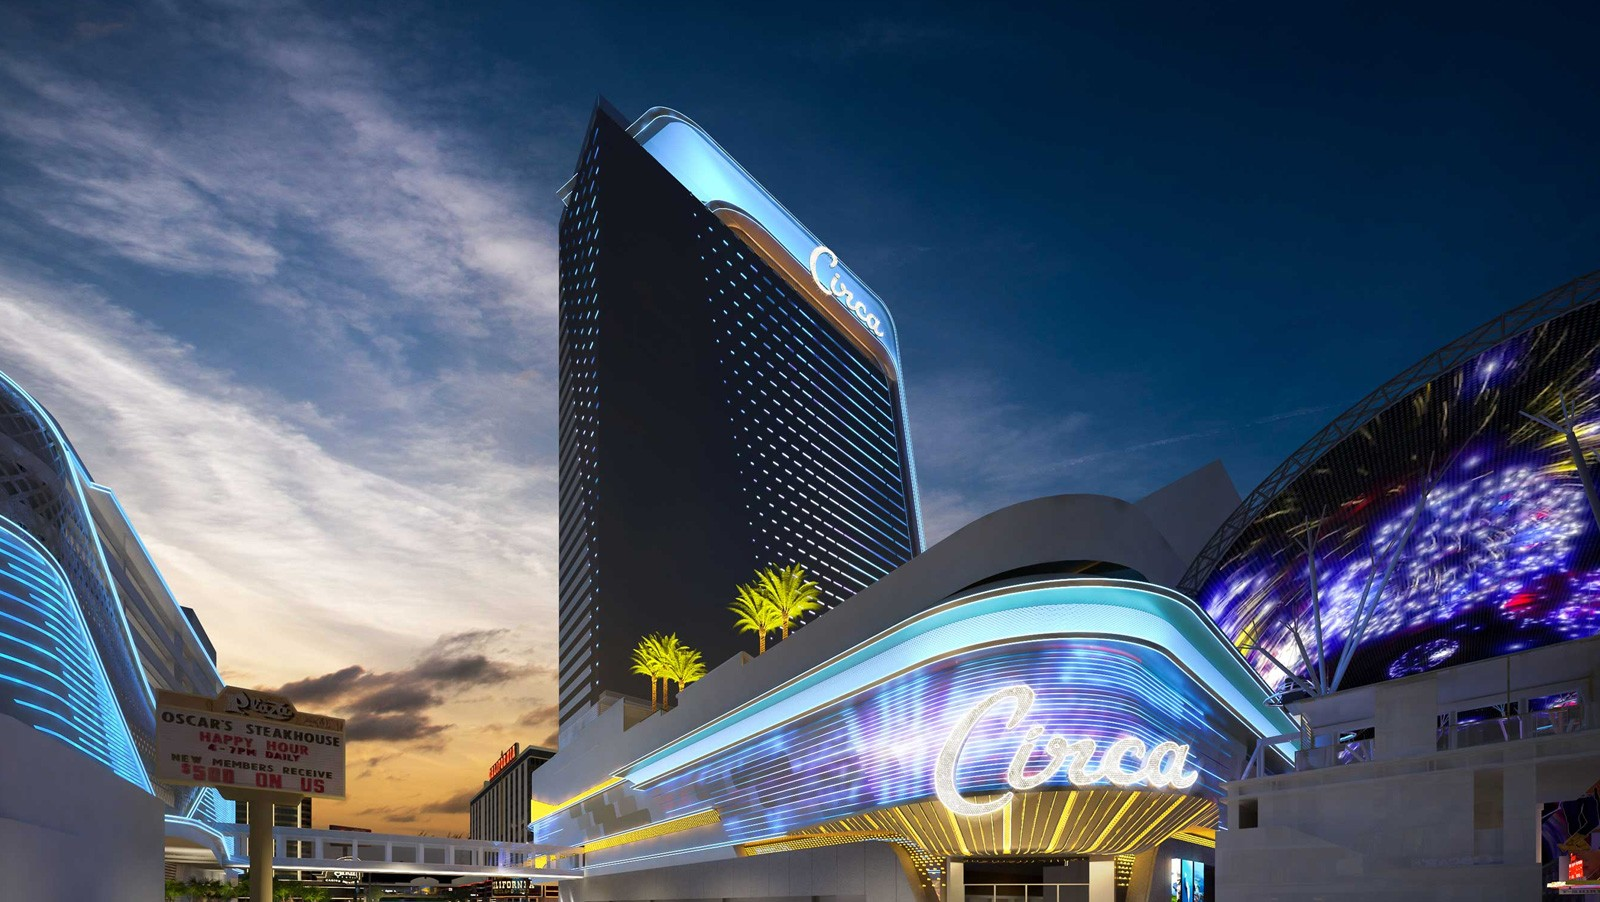 Derek Stevens' new sportsbook venture - Circa Sports - to debut in downtown Las Vegas